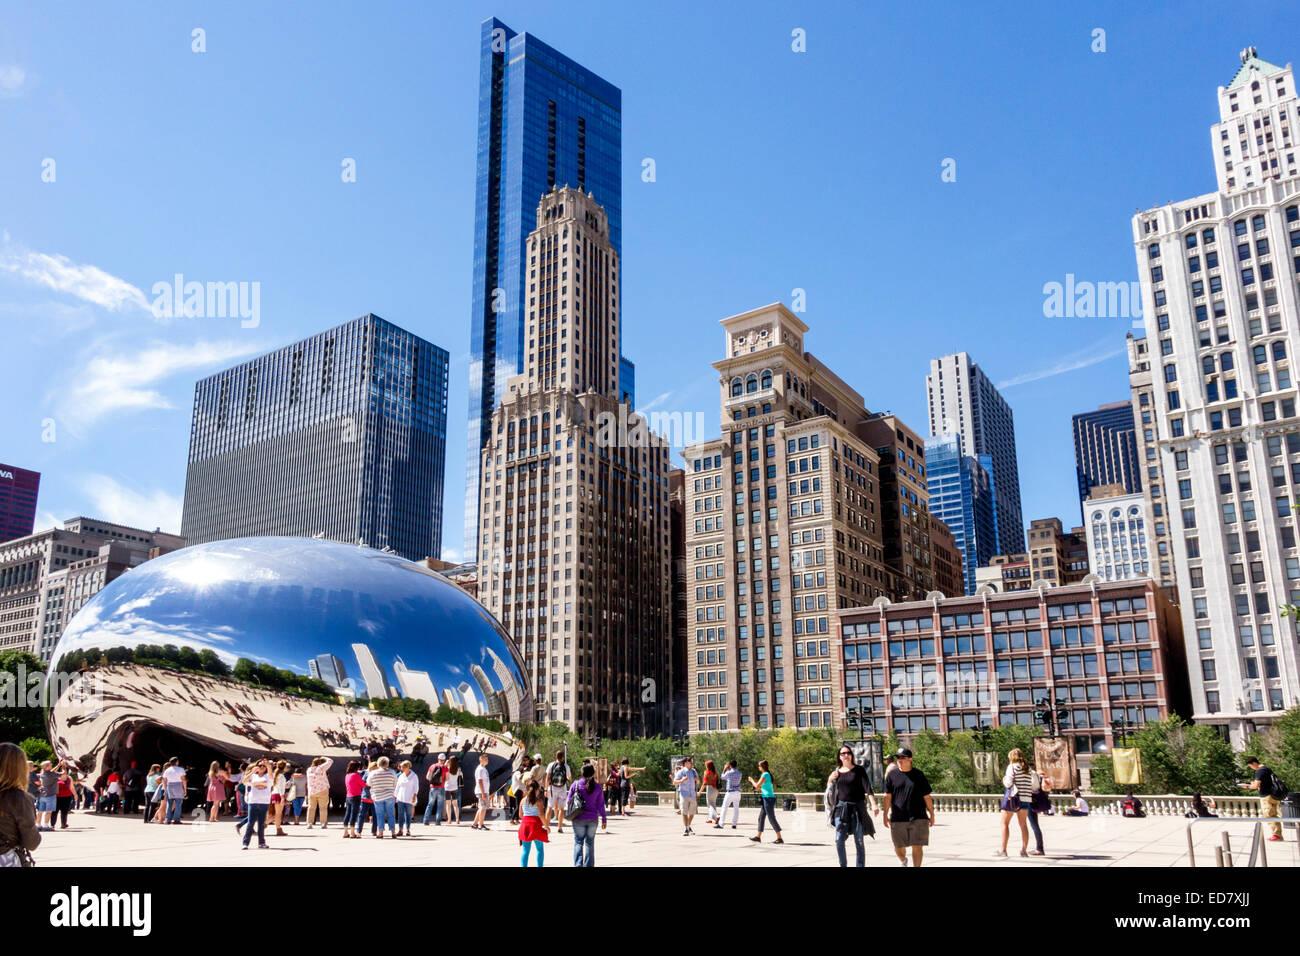 Loop de Chicago, Illinois, el Millennium Park Cloud Gate el frijol artista Anish Kapoor arte público refleja Imagen De Stock